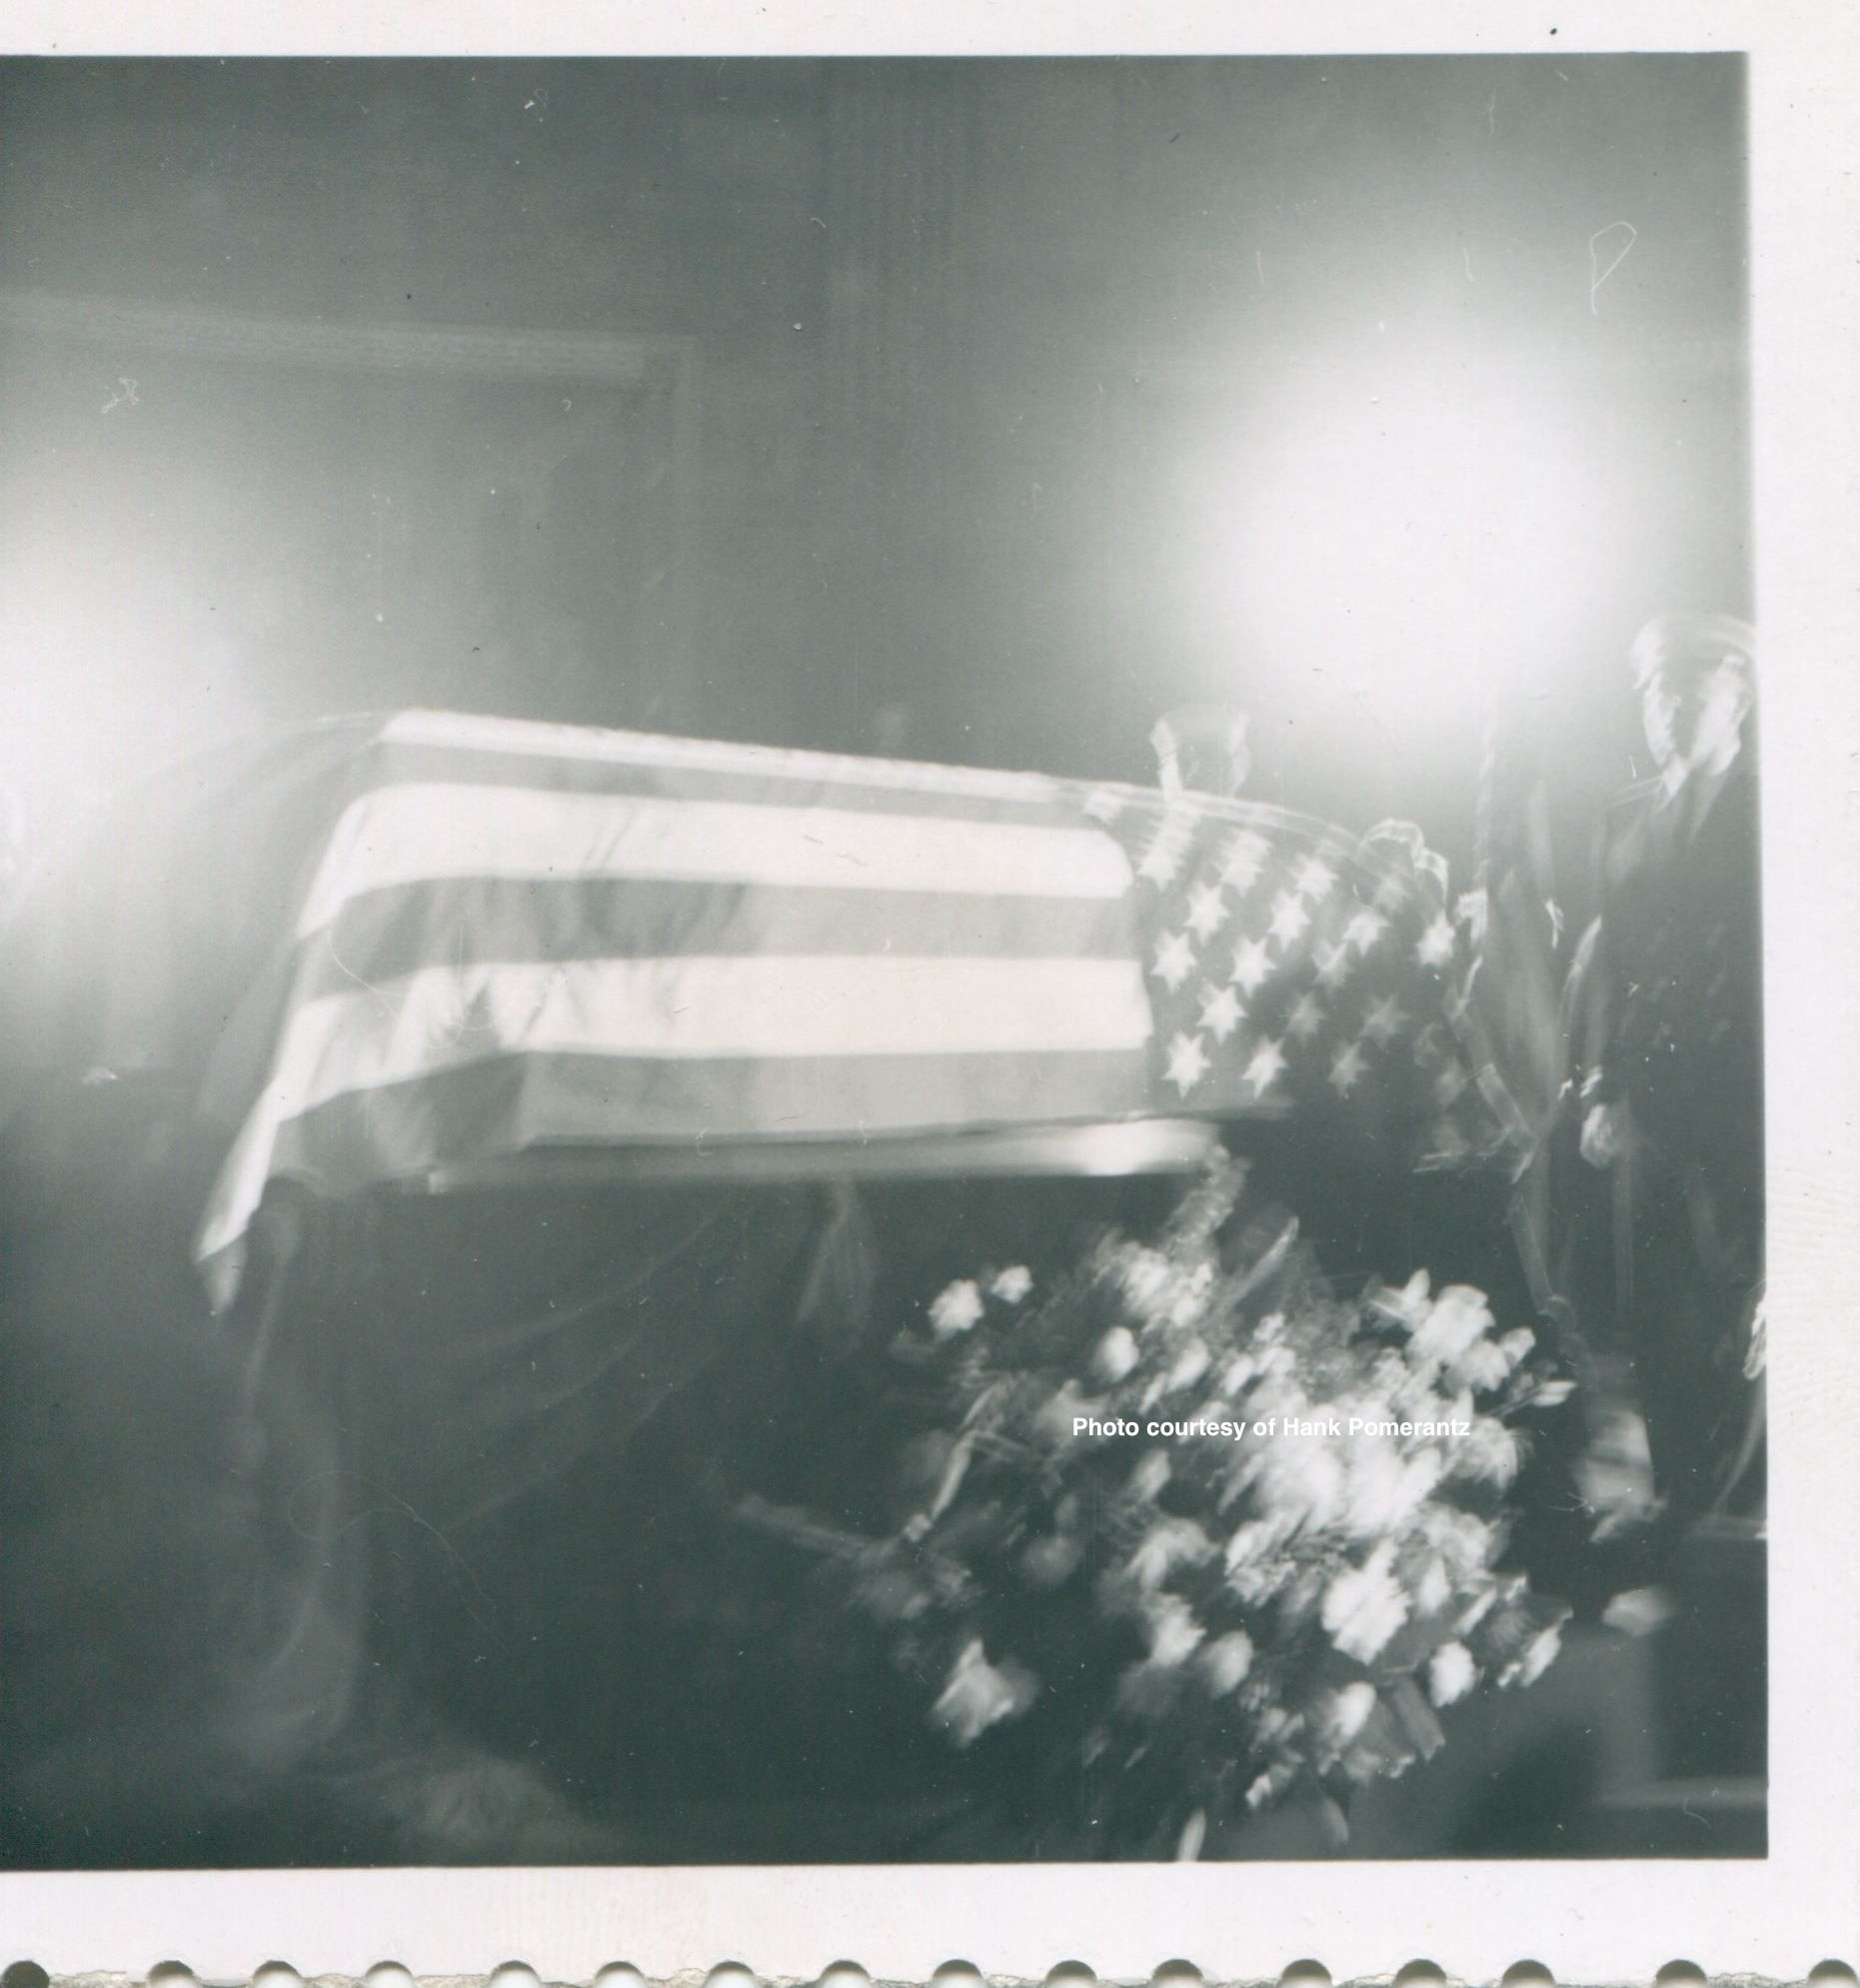 President John F. Kennedy's  casket in the Rotunda. Photo by and courtesy of Hank Pomerantz.